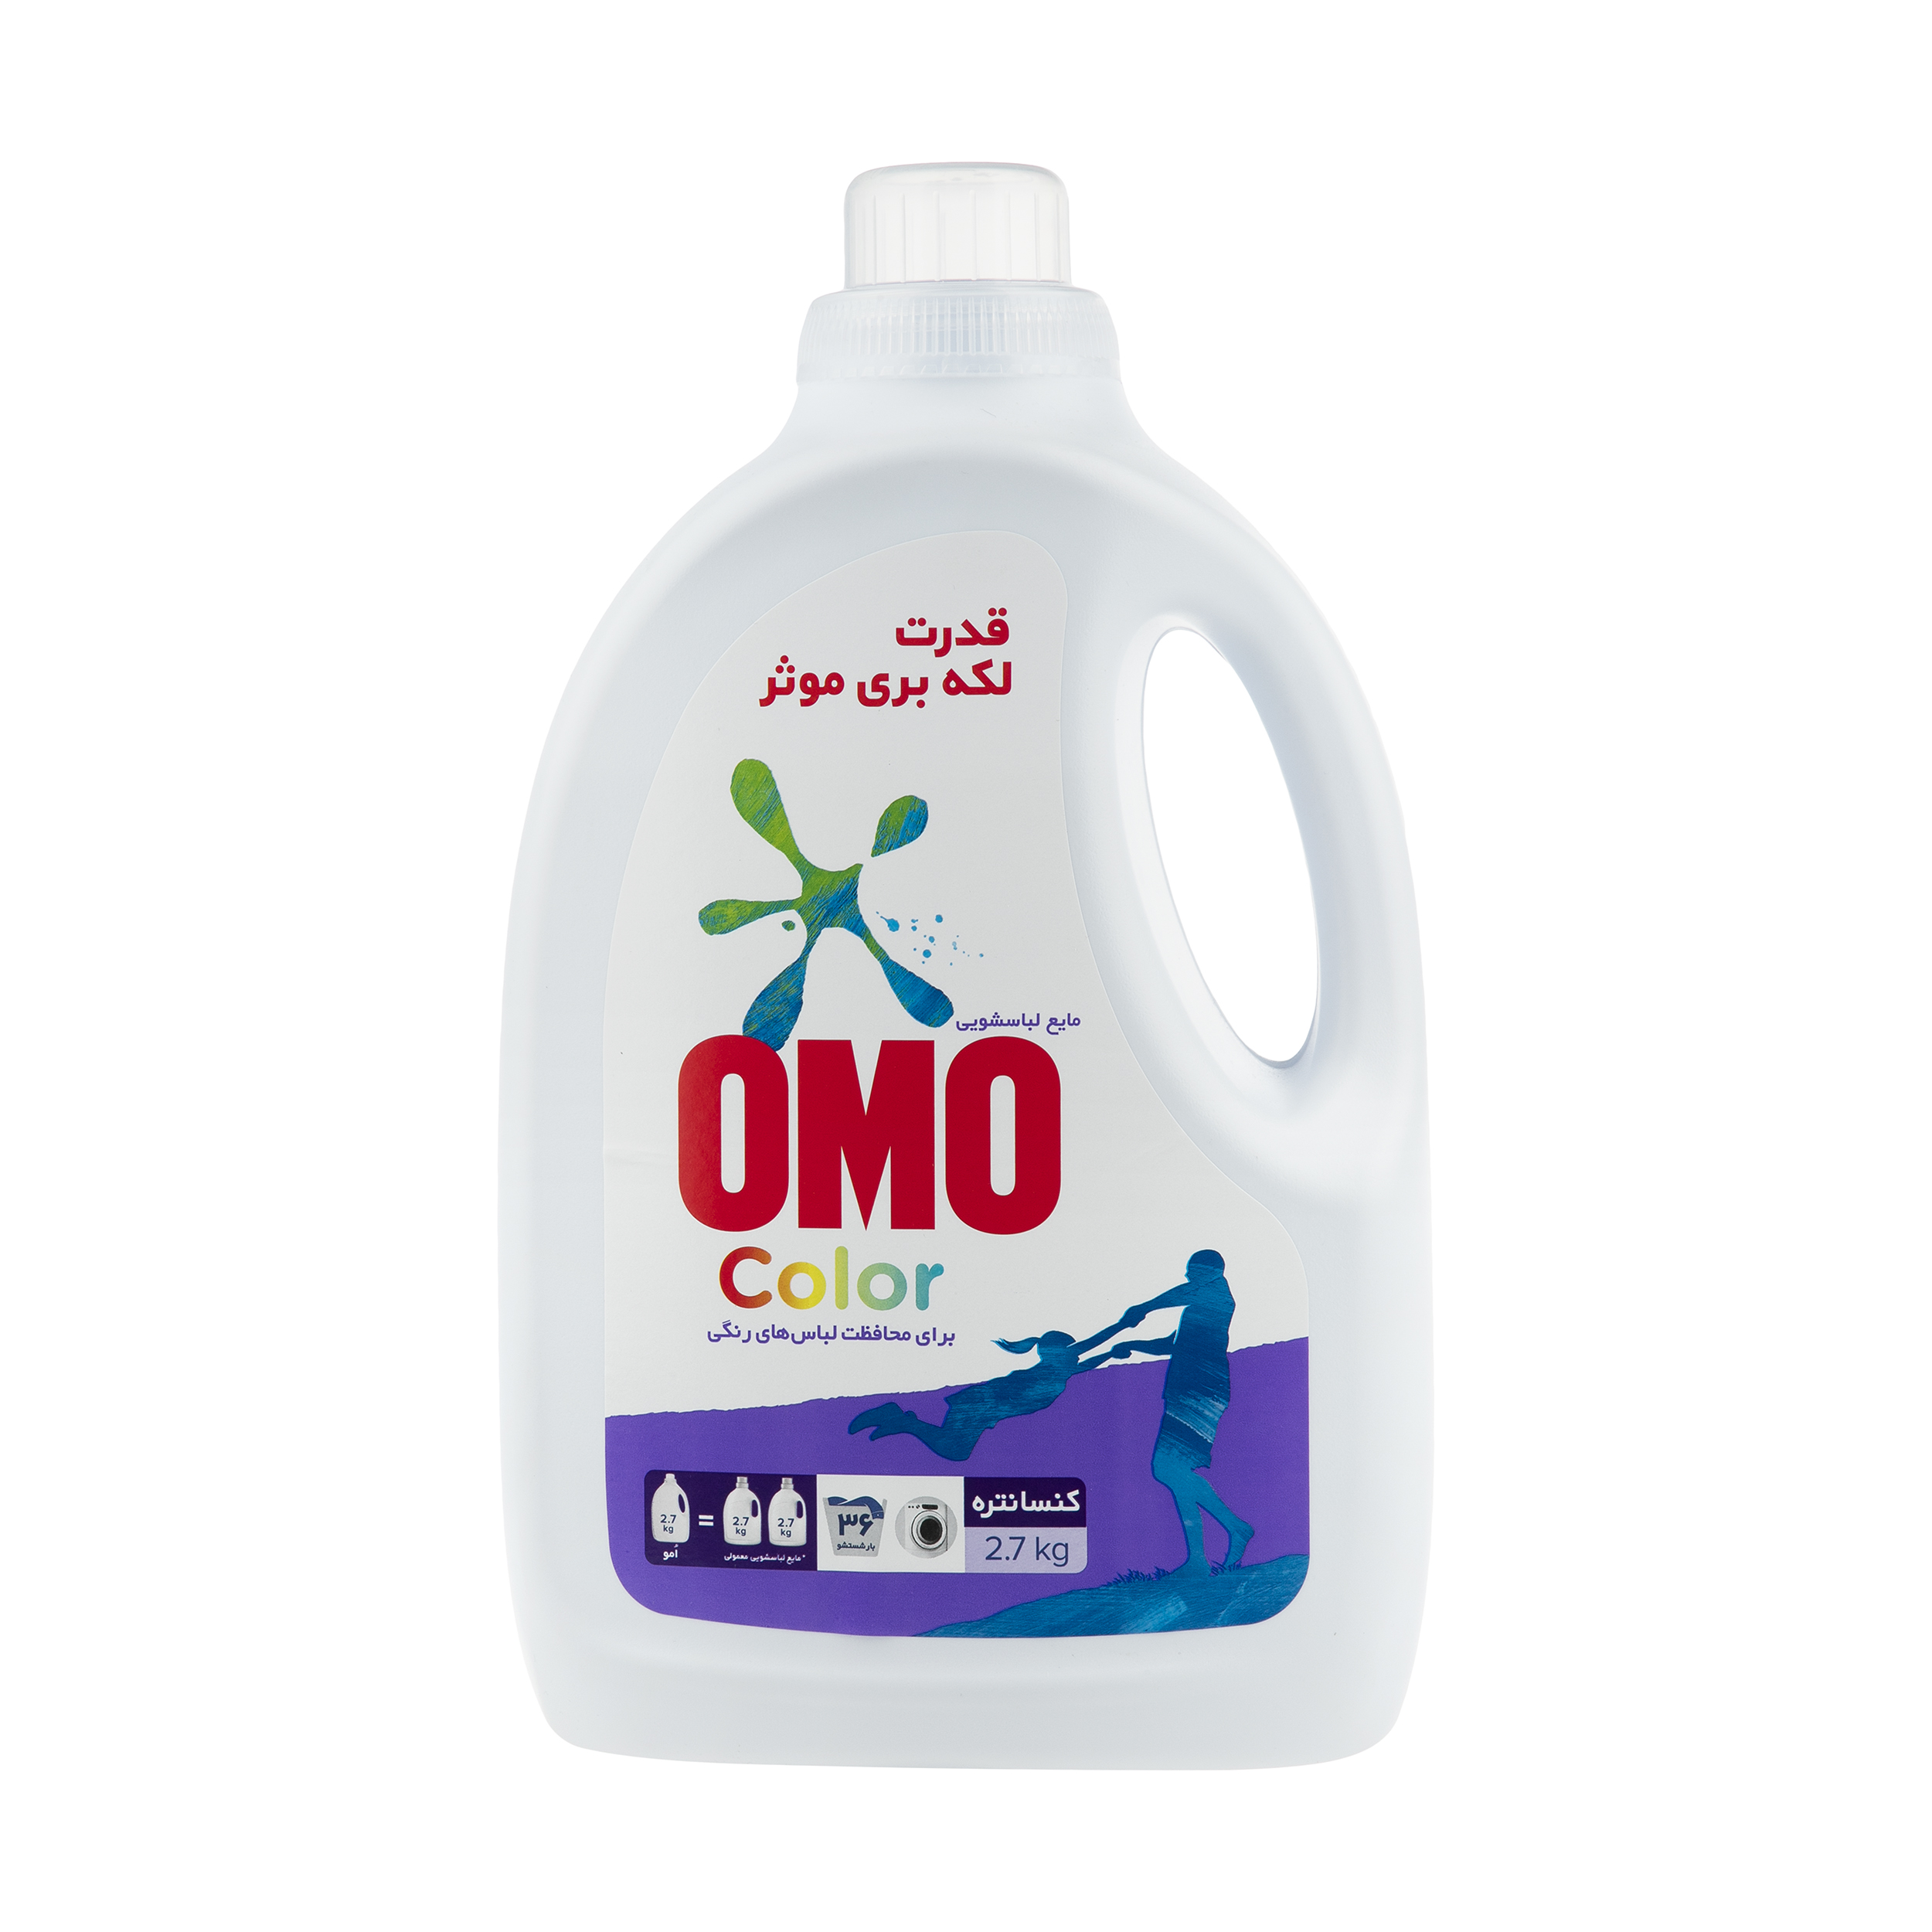 مایع لباسشویی رنگی امو مدل Concentrate مقدار 2.7 کیلوگرم